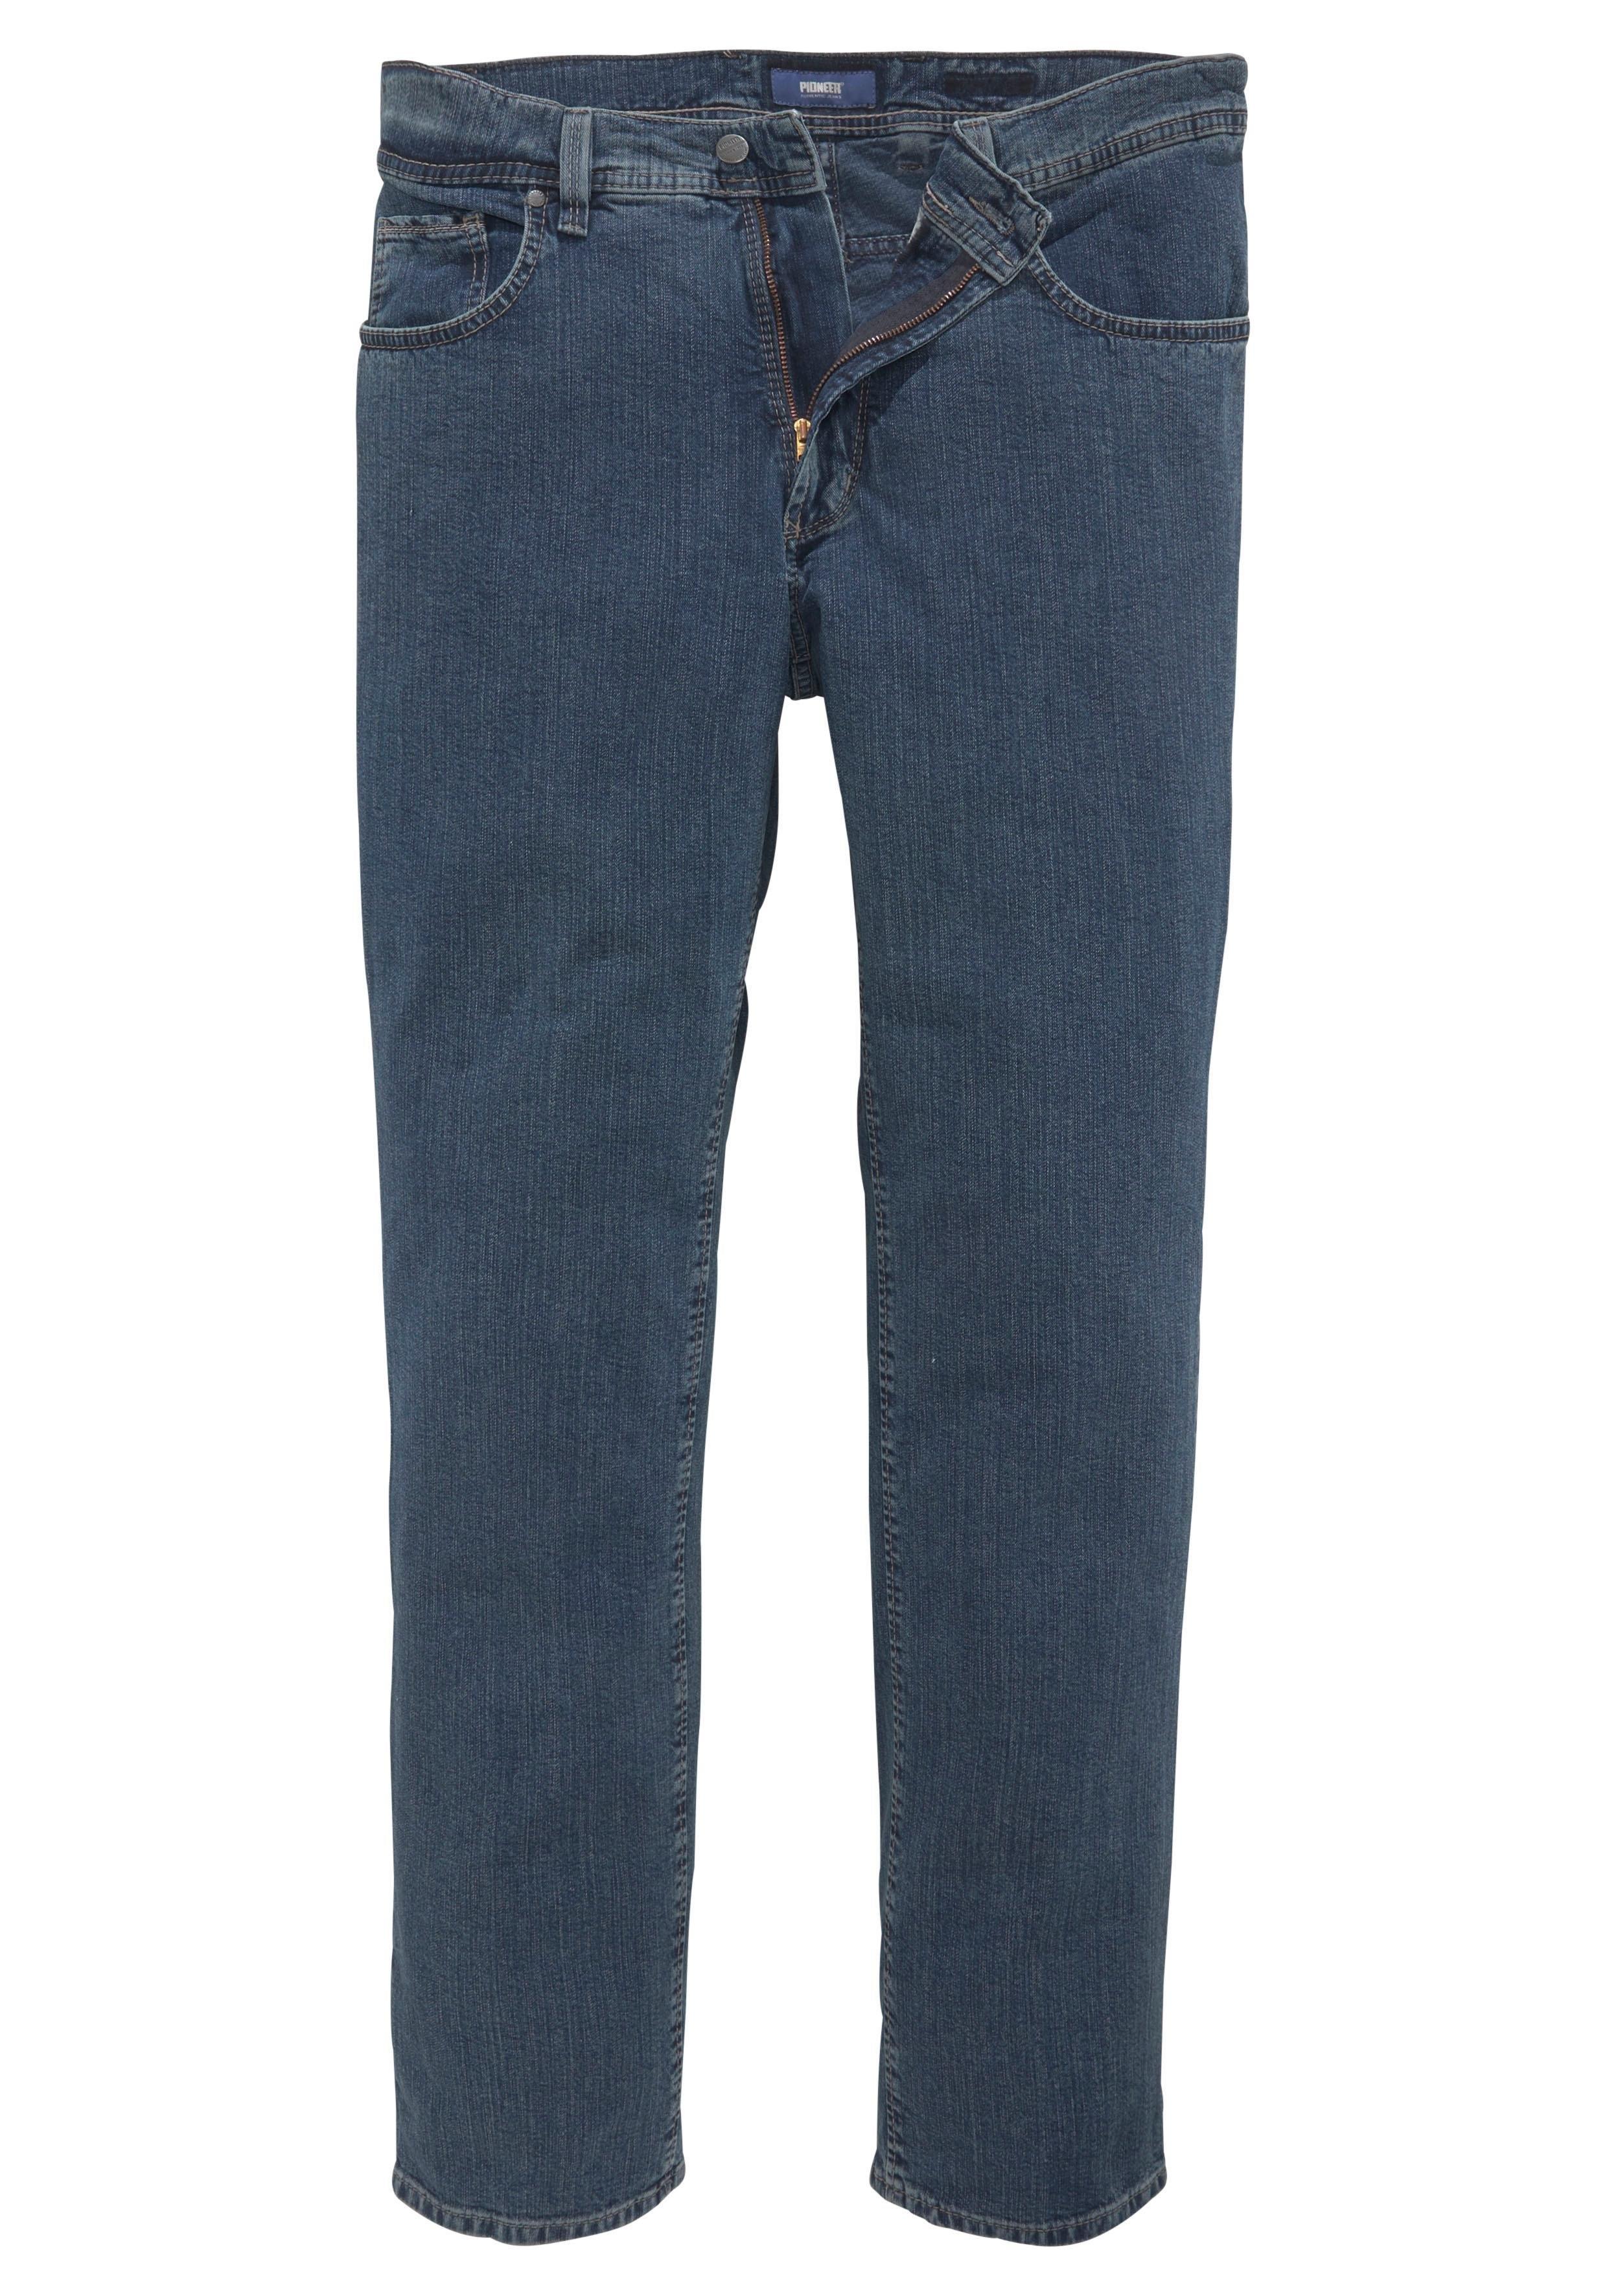 Pioneer Authentic Jeans Stretch jeans Peter goedkoop op otto.nl kopen